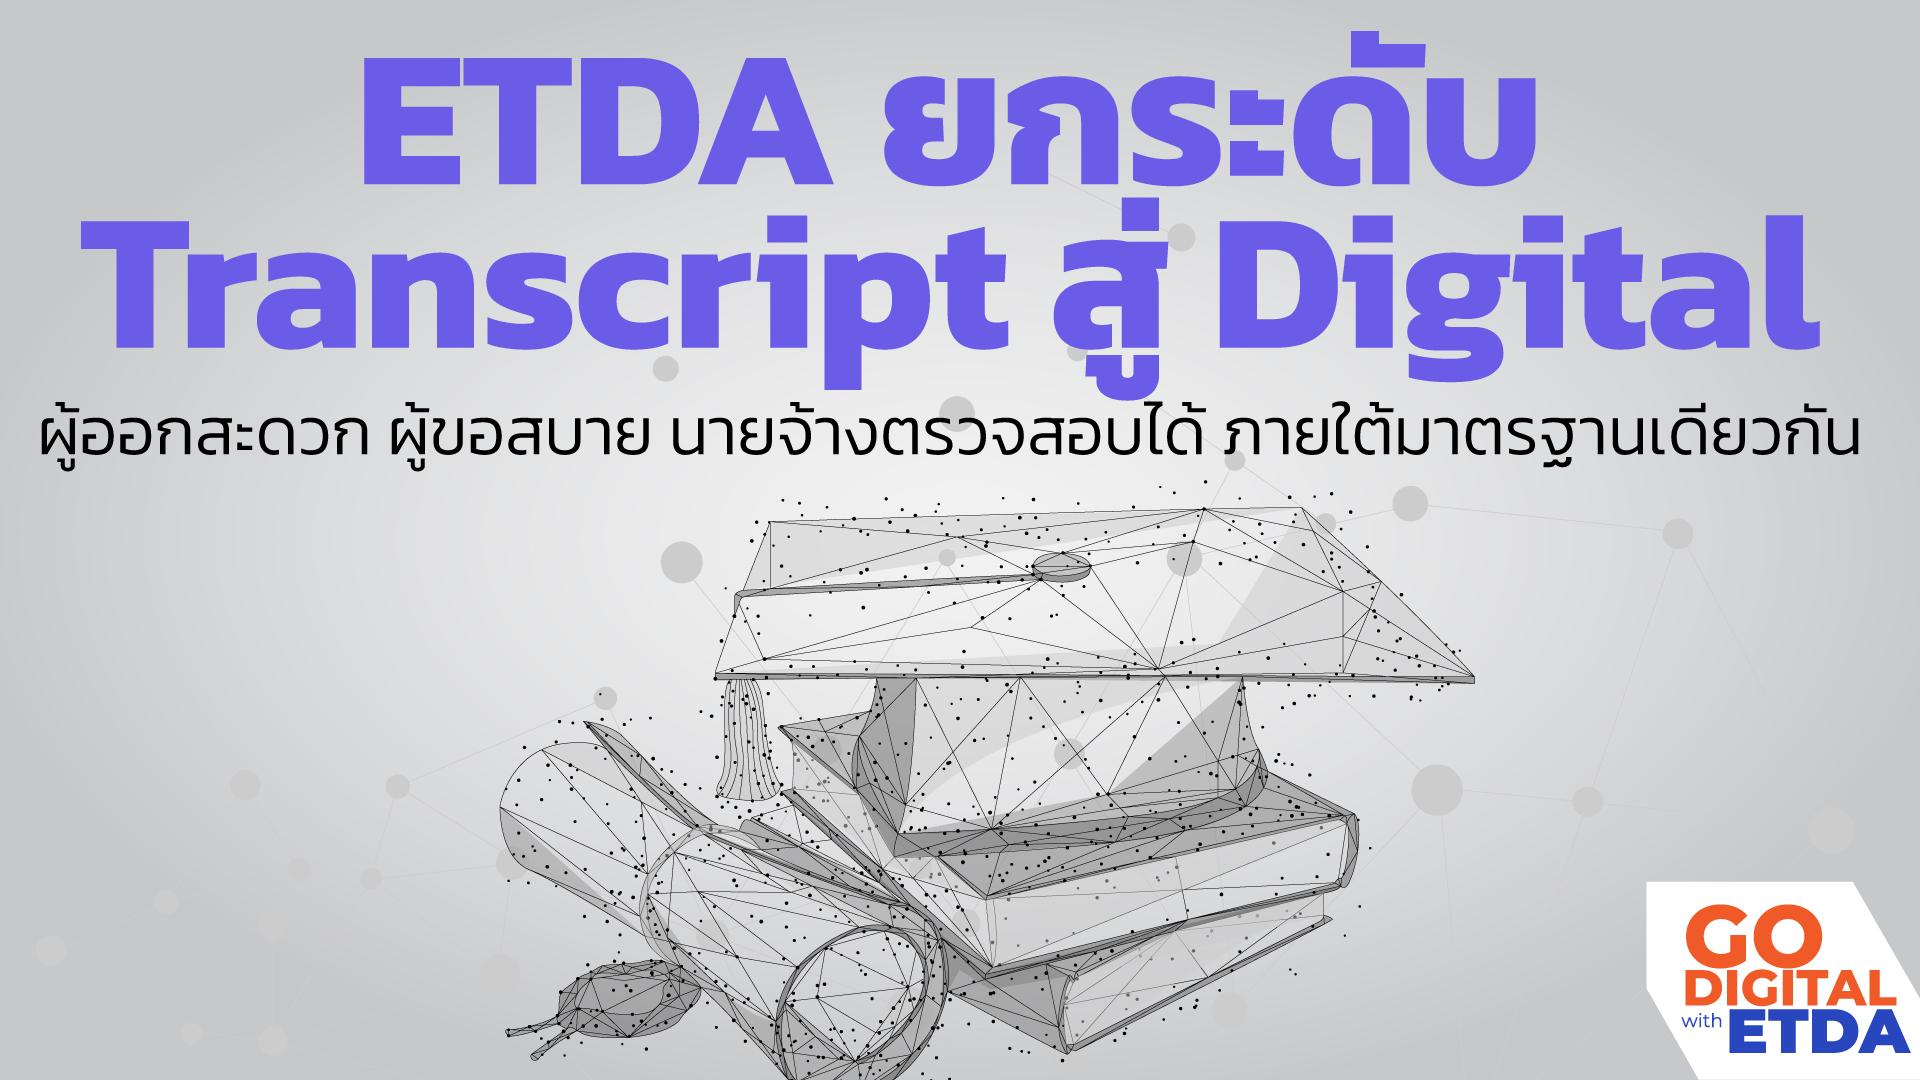 ETDA ยกระดับ Transcript สู่ Digital ผู้ออกสะดวก ผู้ขอสบาย นายจ้างตรวจสอบได้ ภายใต้มาตรฐานเดียวกัน